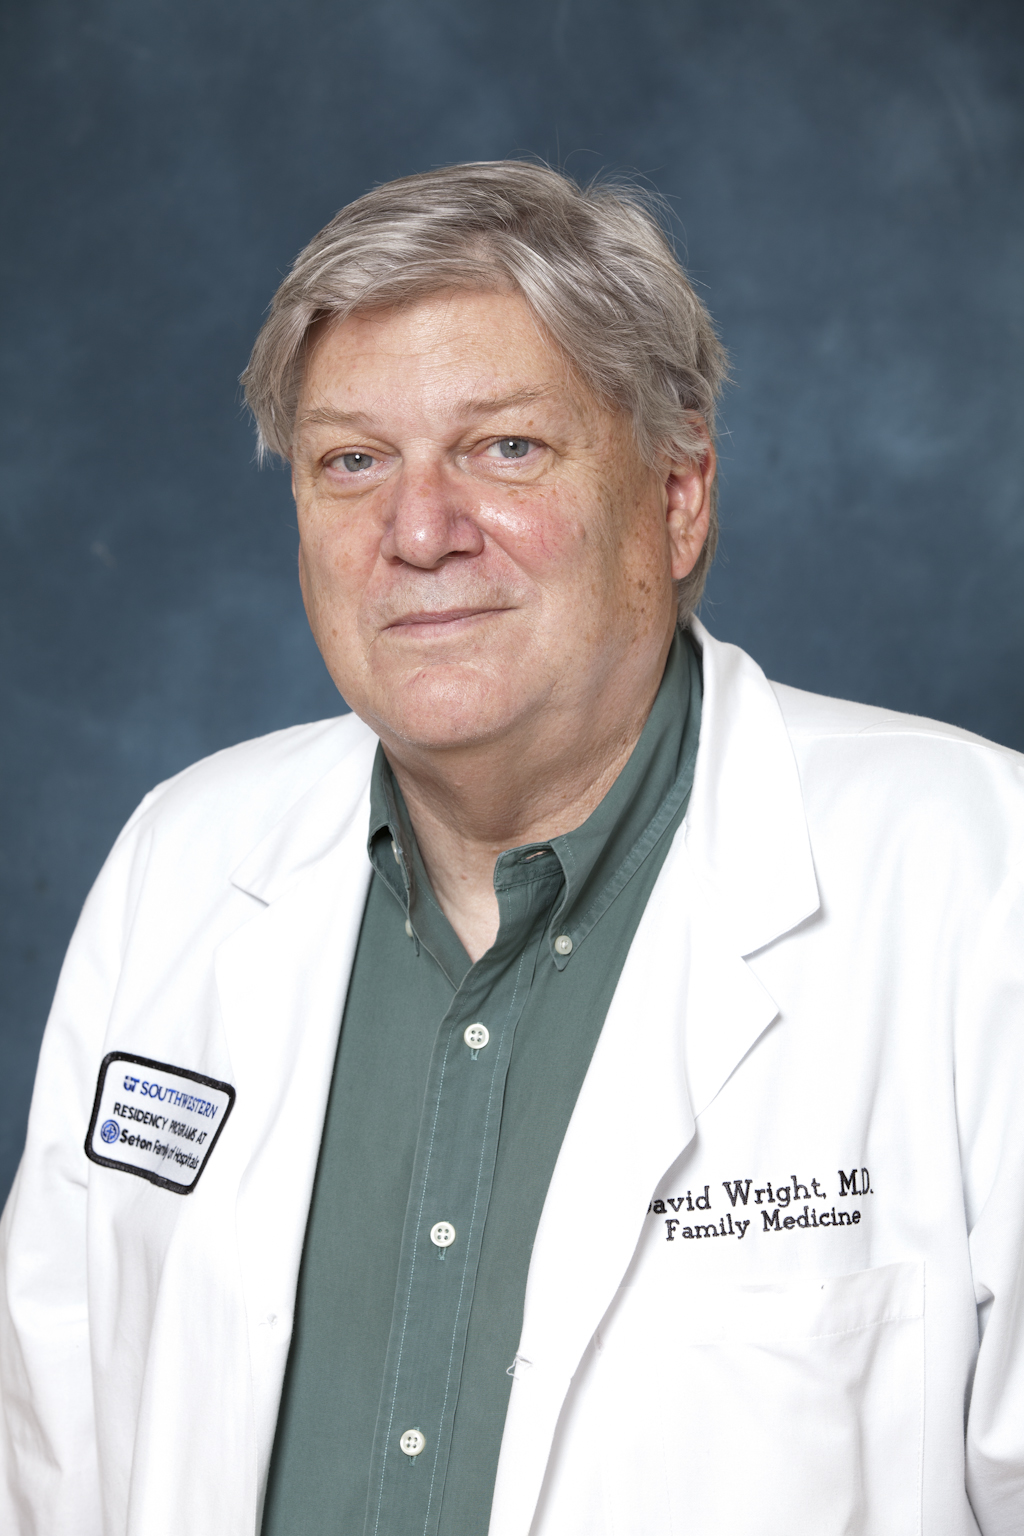 David Wright, MD